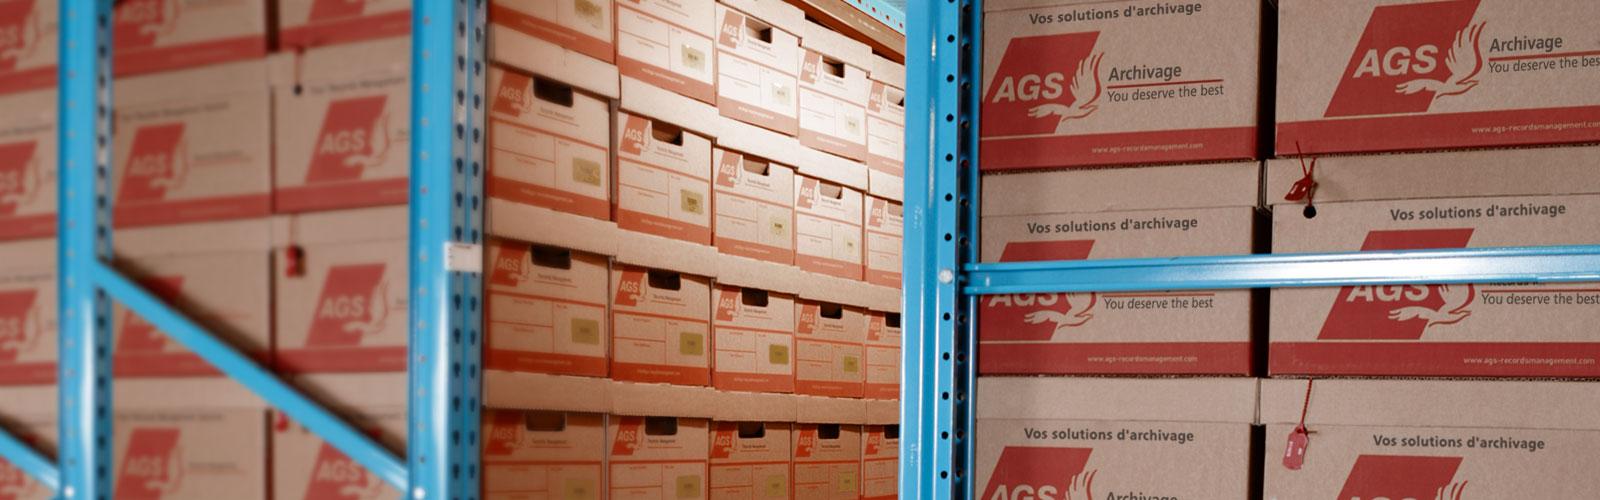 record-storage-warehouse